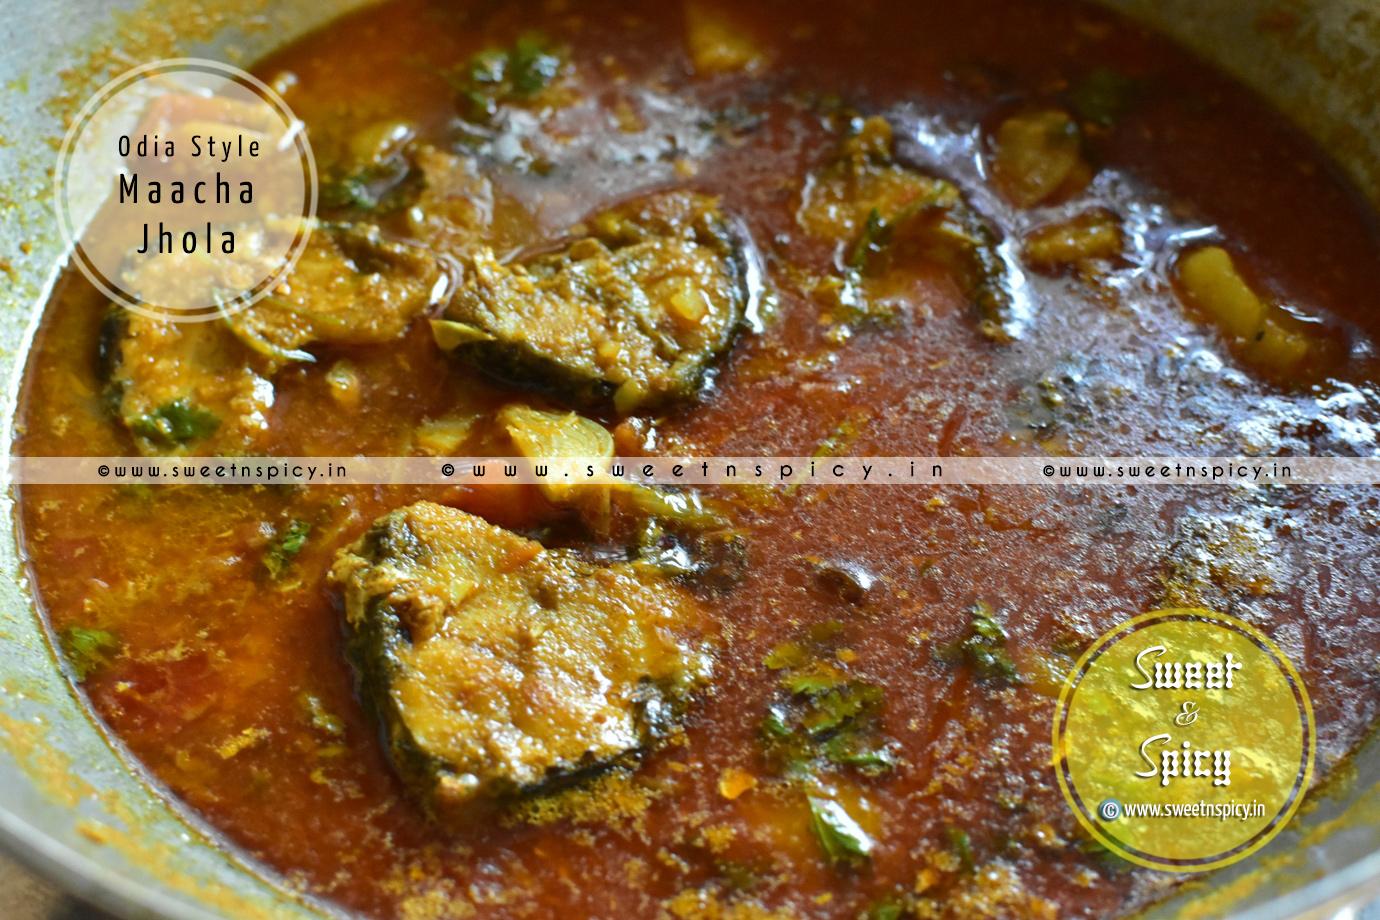 Odia Style Macha Jhola (Fish Curry)